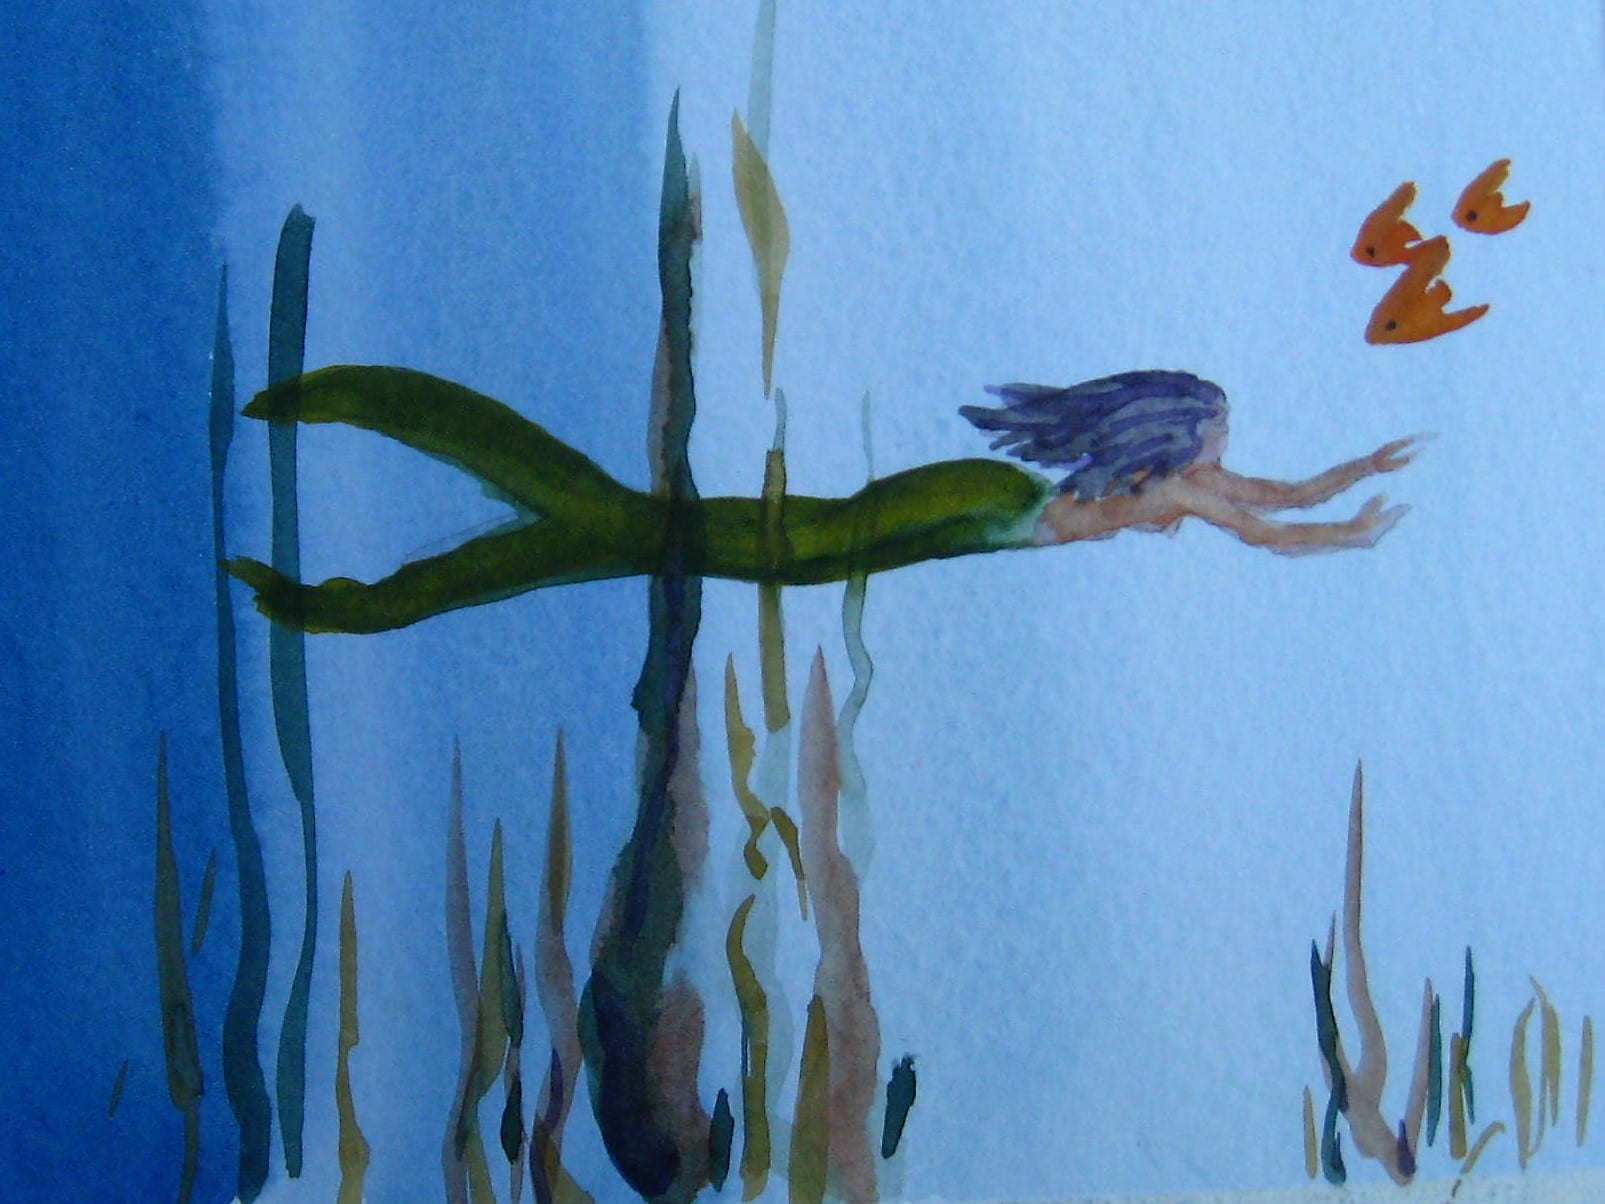 Mermaid and 3 fish